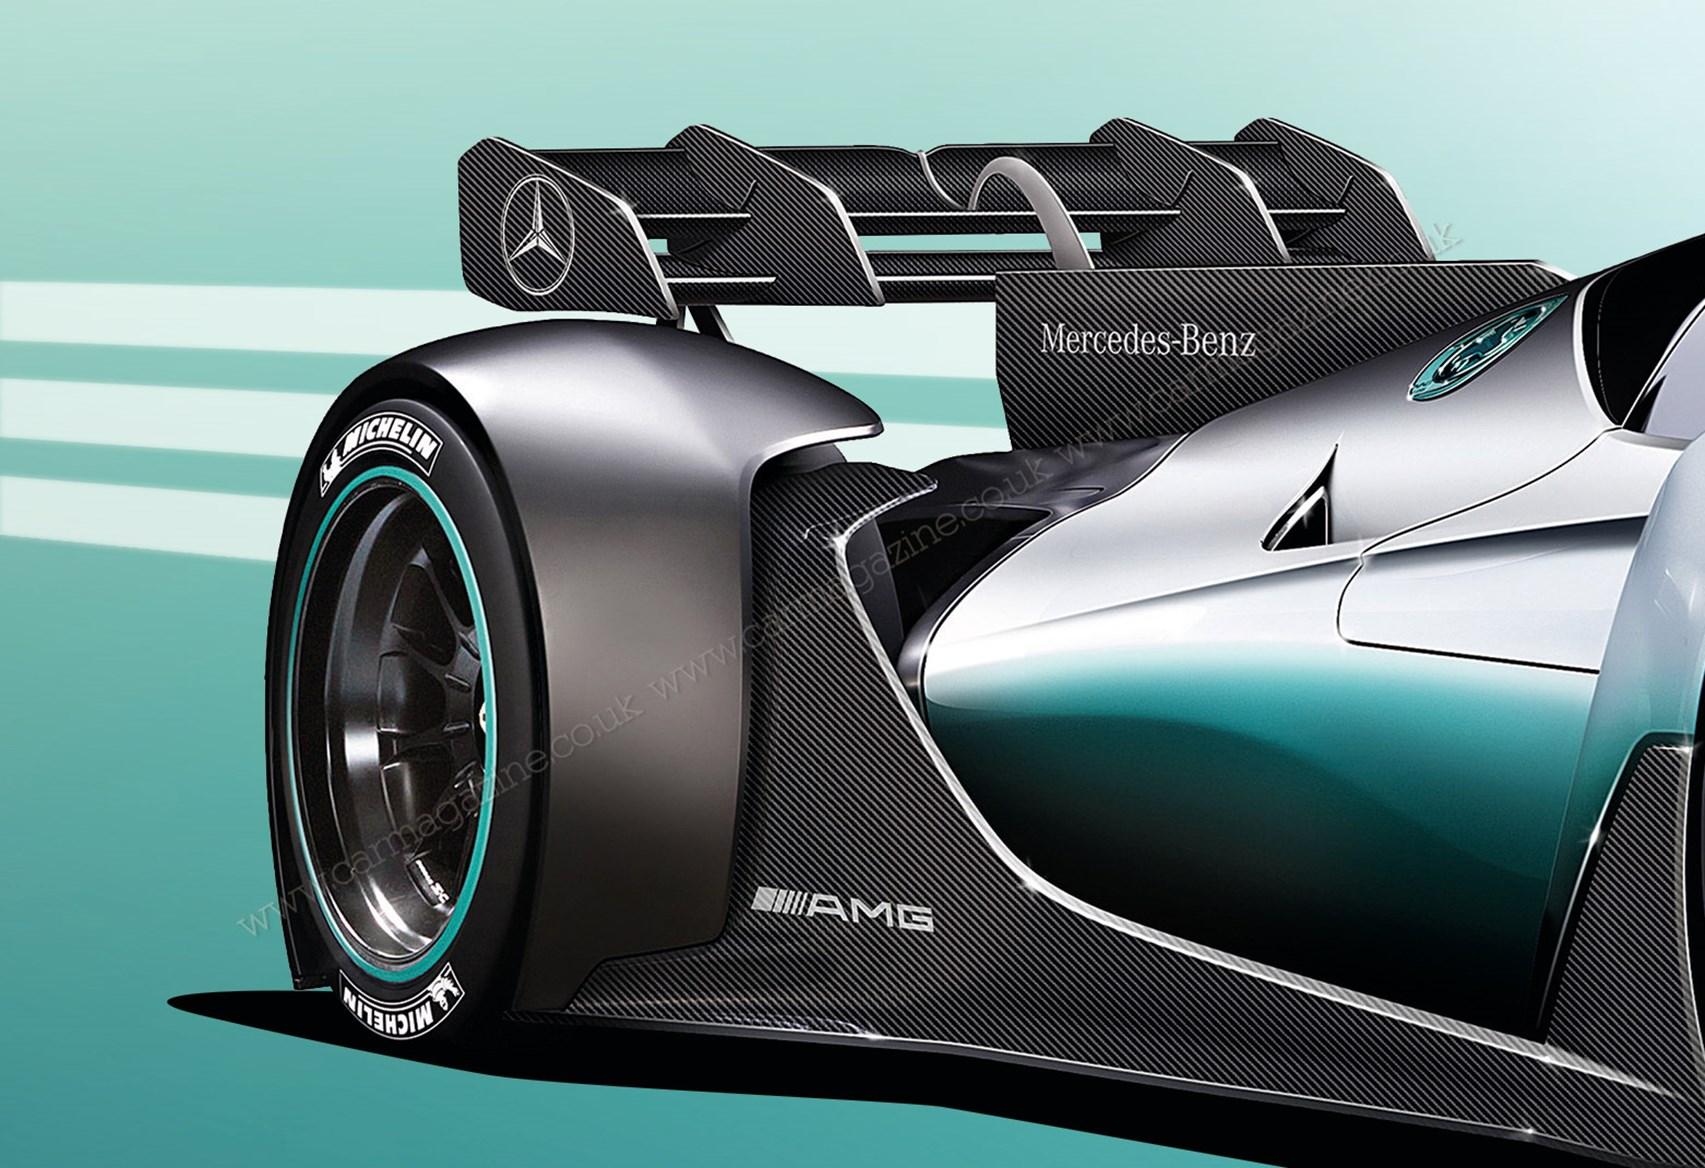 Mercedes amg f1 w08 wallpaper 4